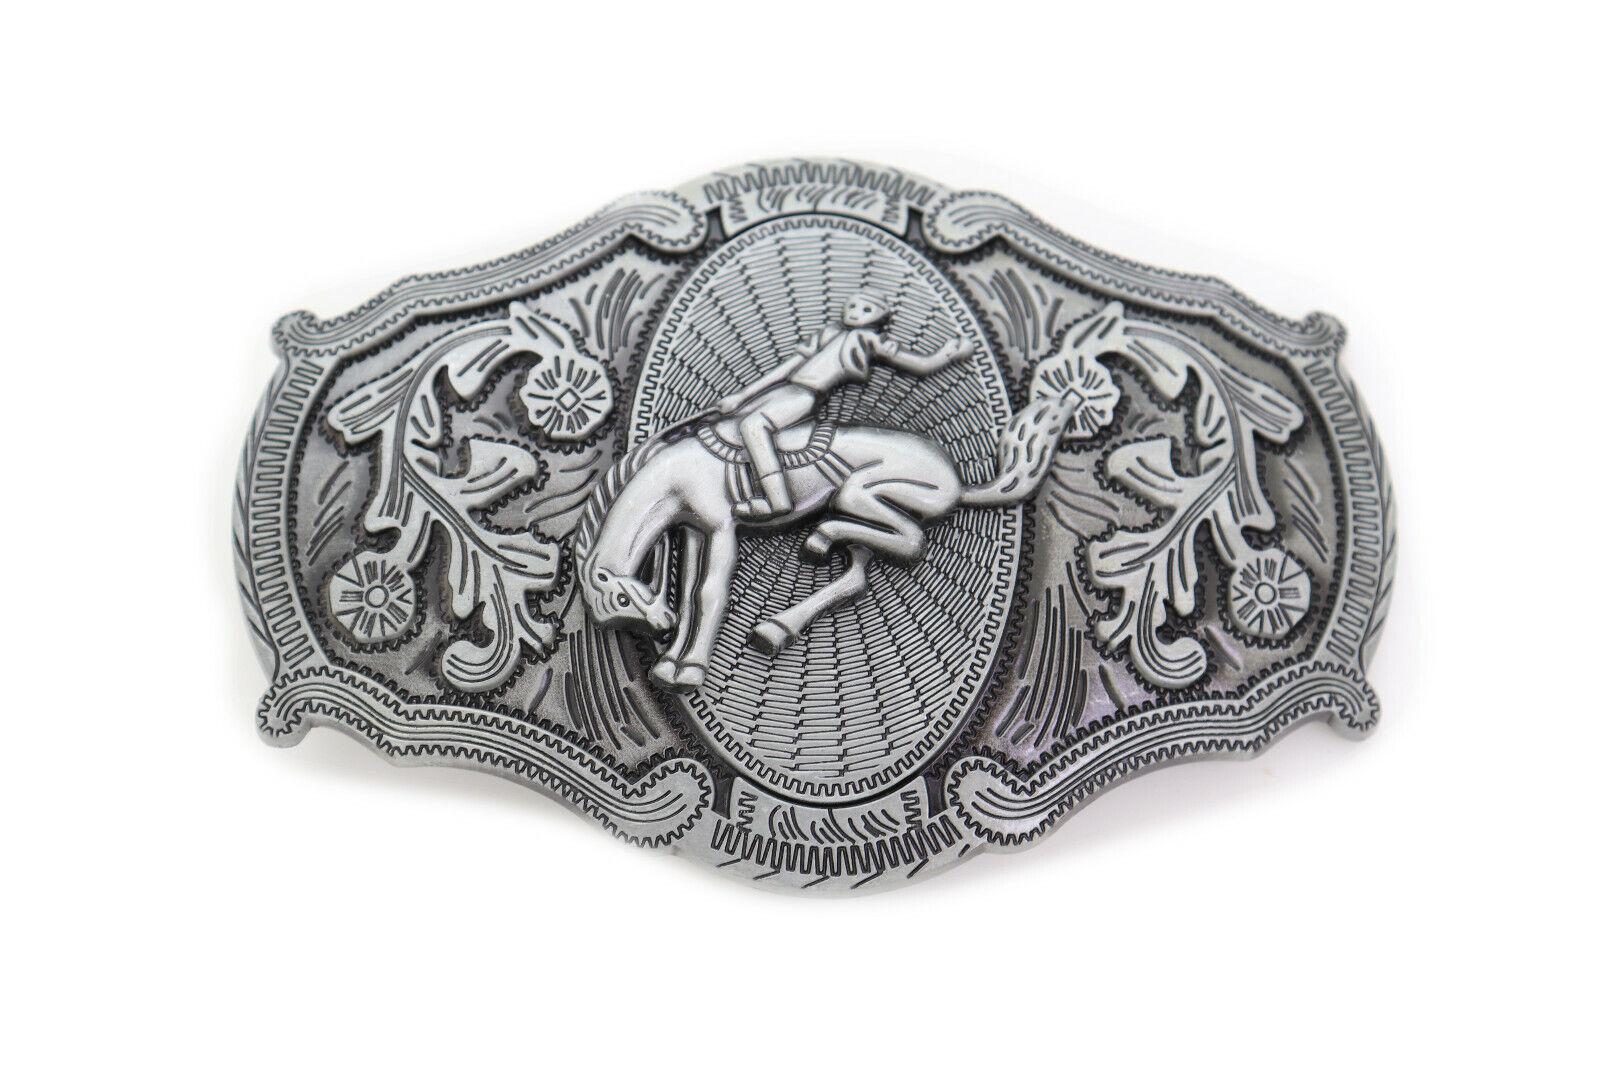 New Men Women Dark Silver Metal Belt Buckle Cowboy Rodeo Horse Cowboy Jeans Pant